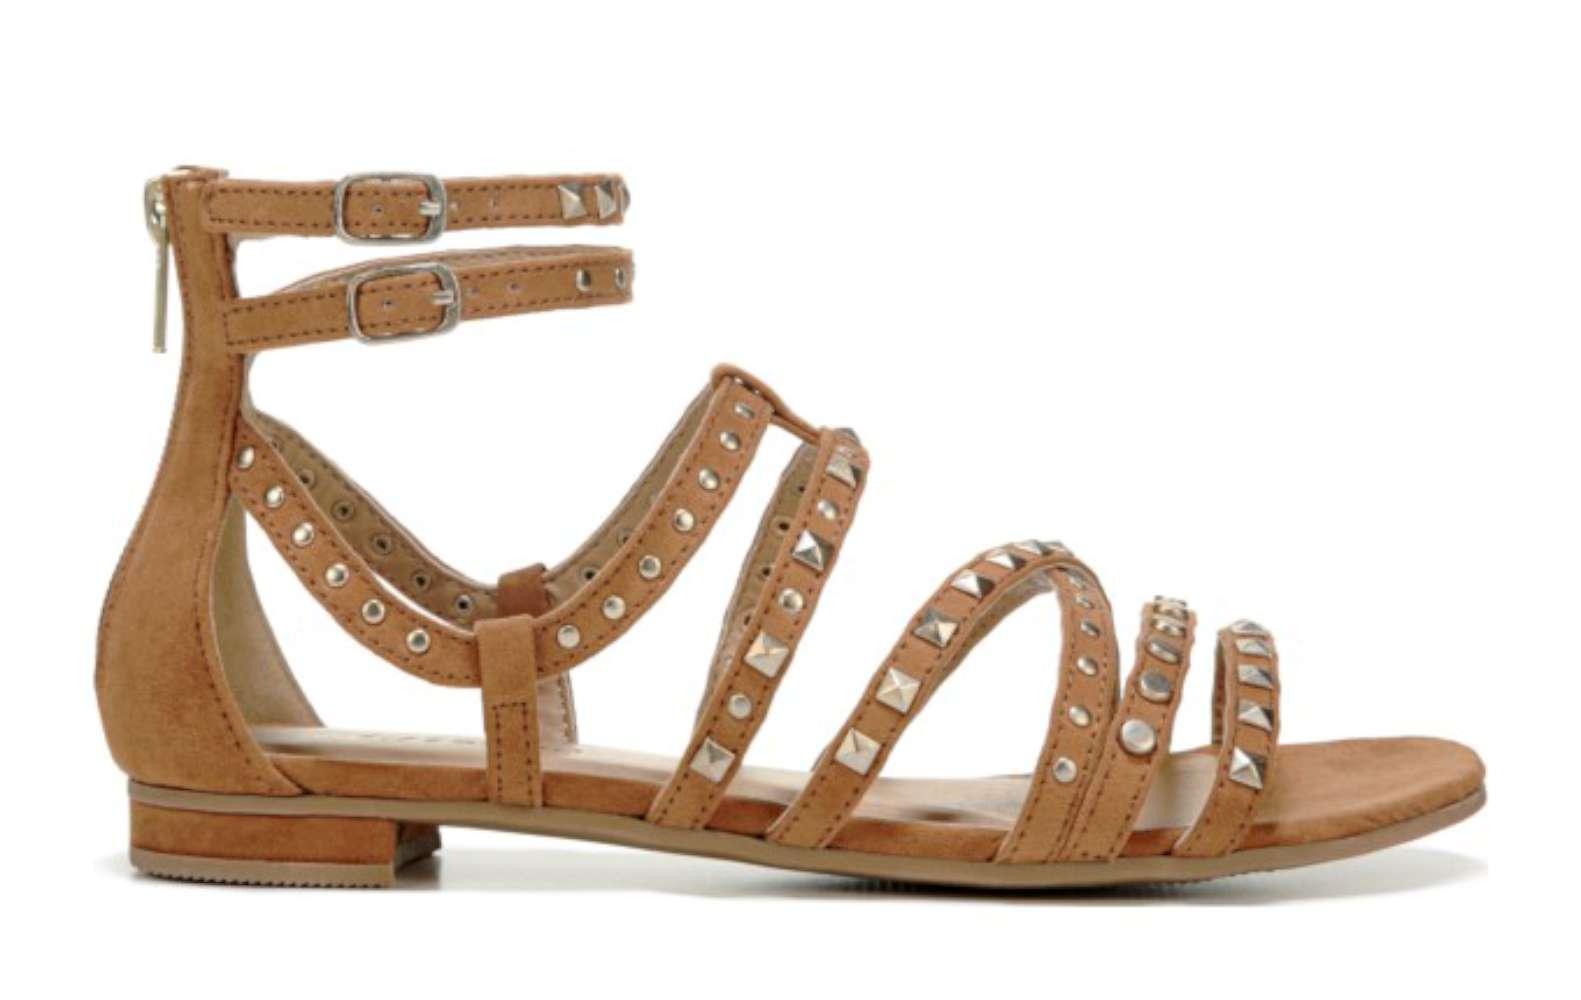 75e7ce9f35d Zigi Soho Womens Pearlie Leather Open Toe Casual Strappy Sandals